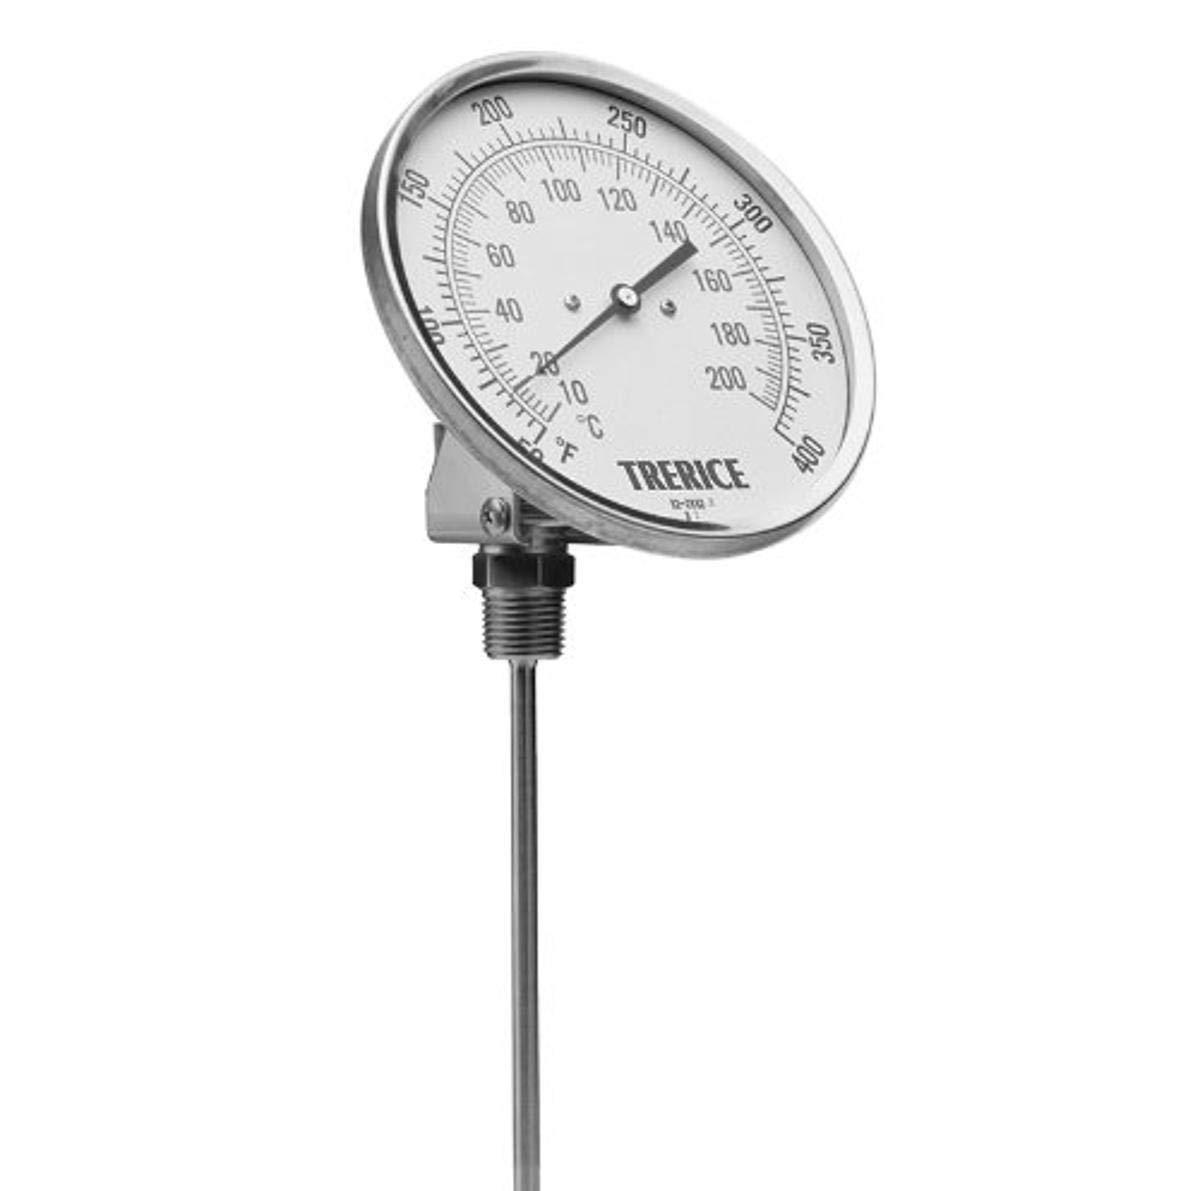 Trerice B8360204 Adjustable Angle Cheap SALE Start Bimetal Price reduction 2